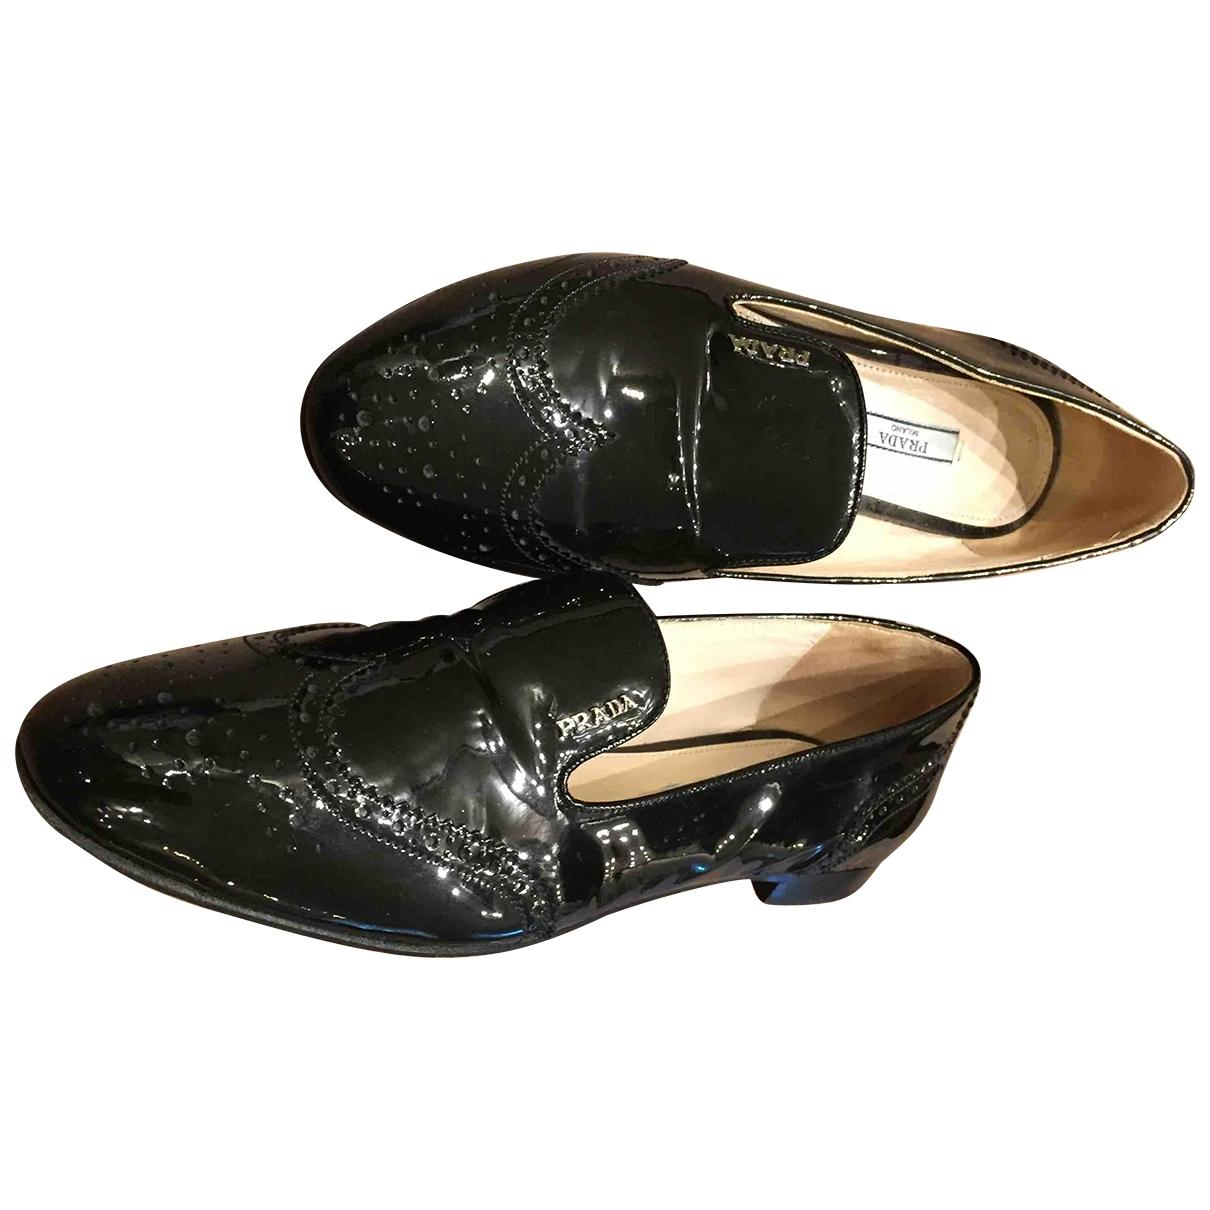 Prada \N Black Patent leather Flats for Women 37.5 EU